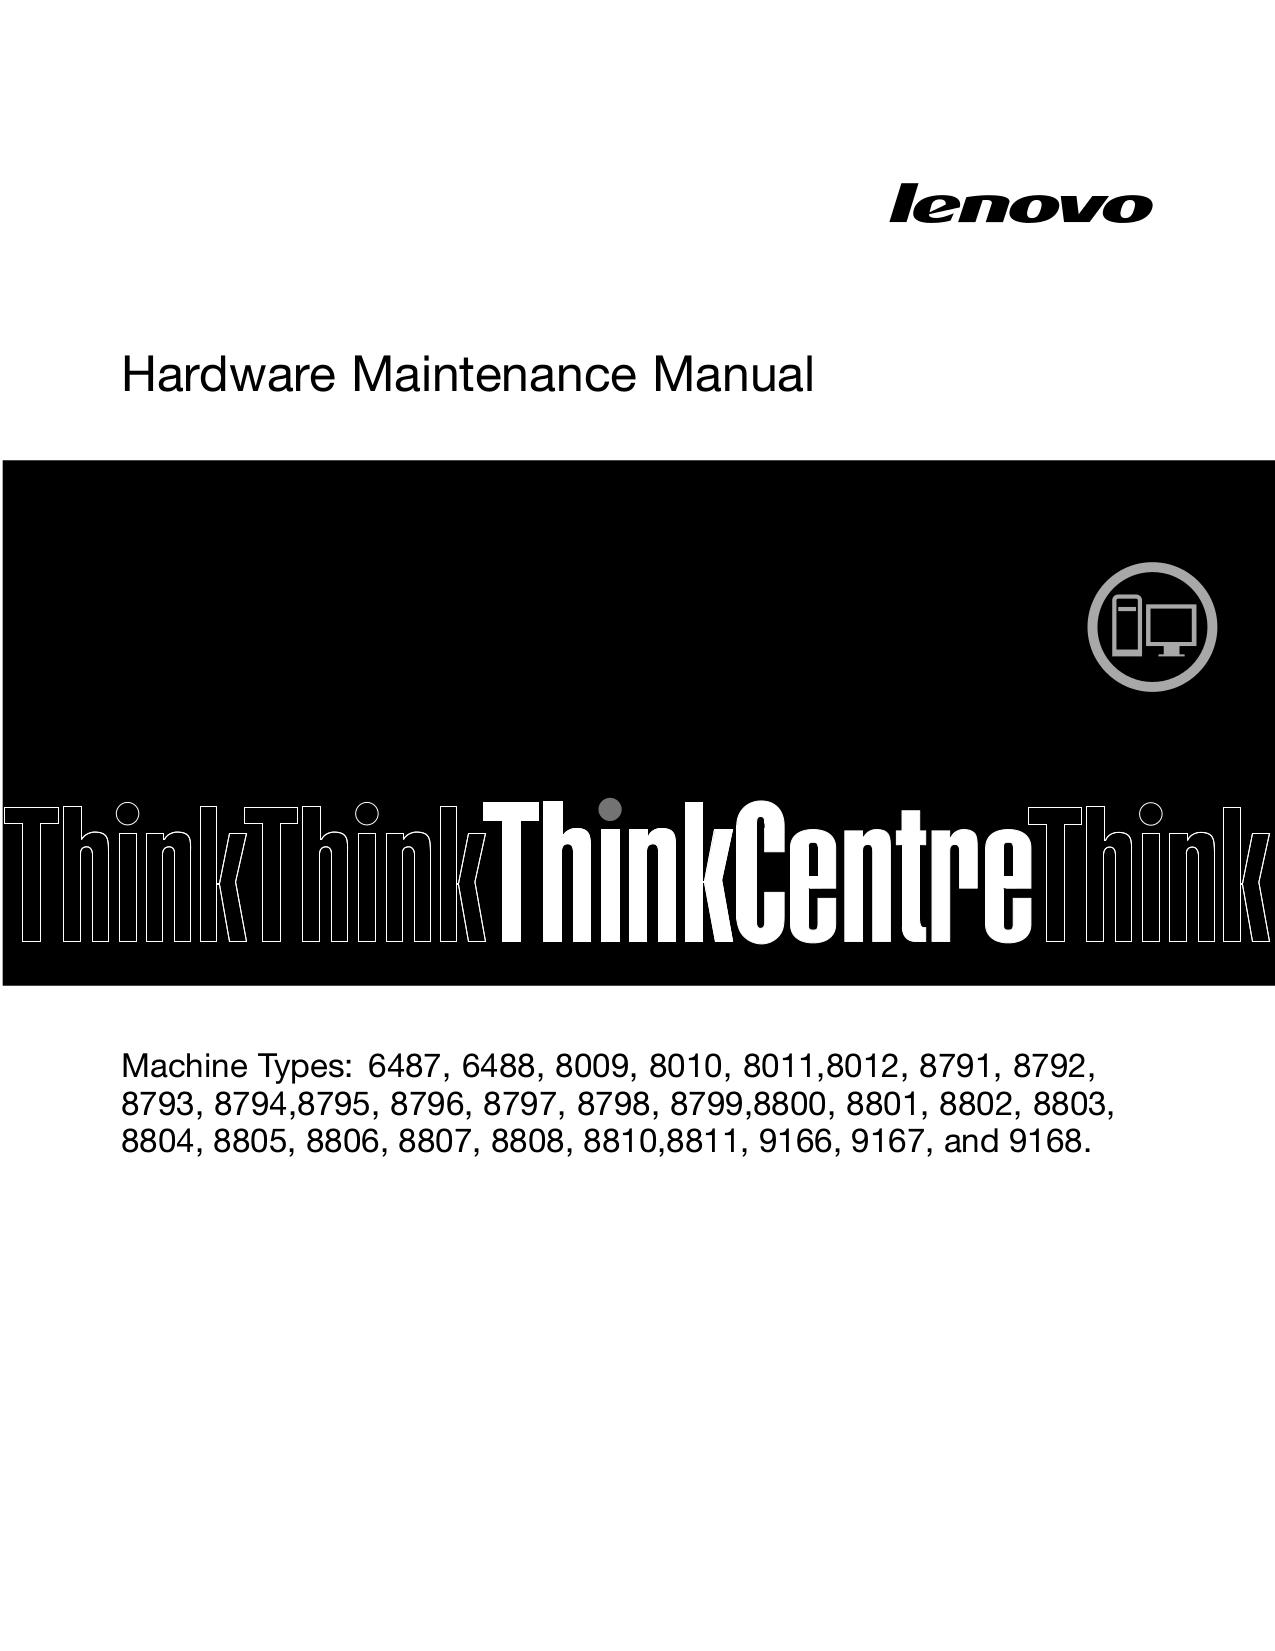 pdf for Lenovo Desktop ThinkCentre M55 8808 manual